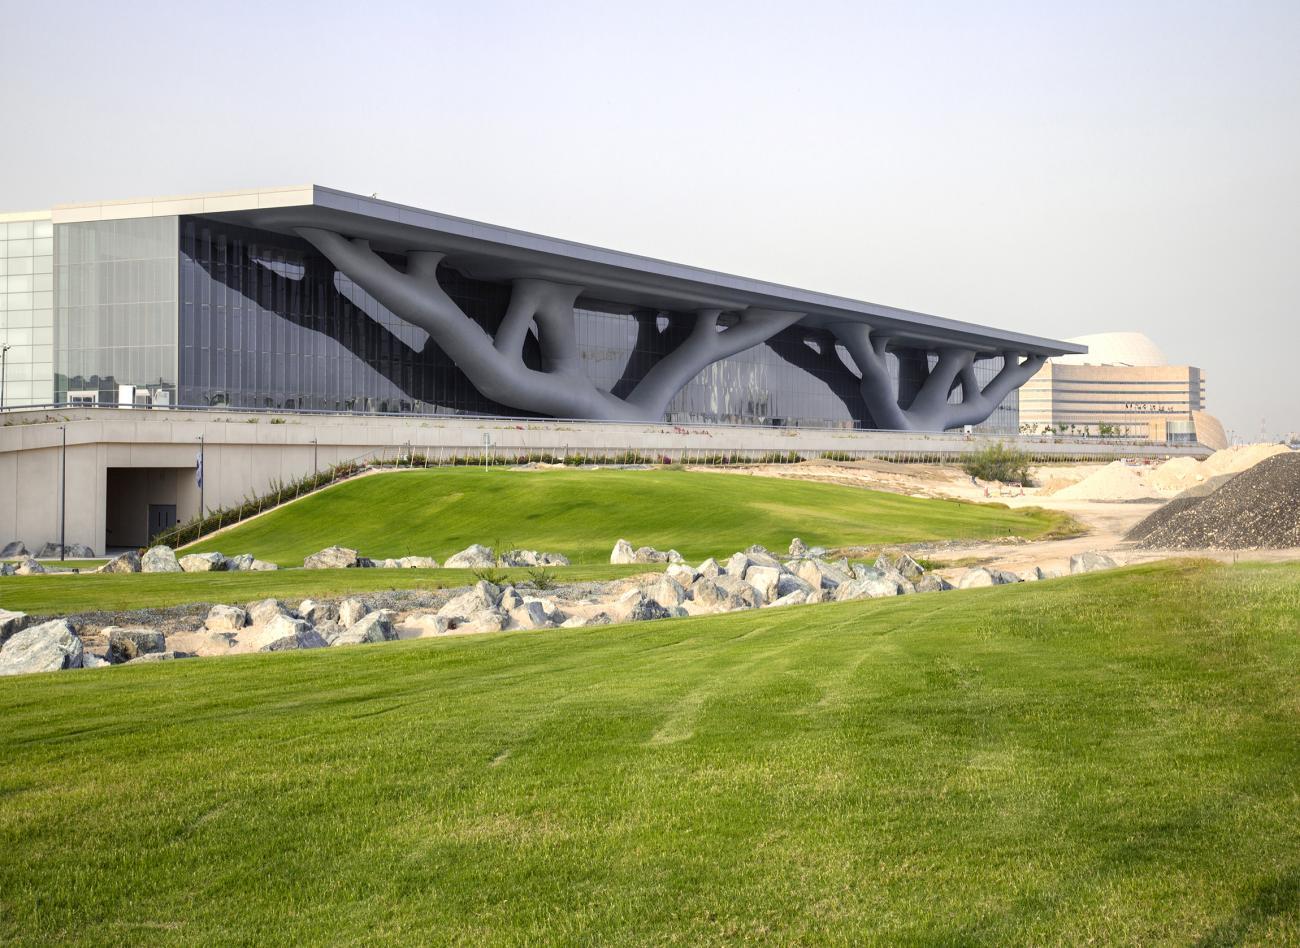 Qatar National Convention Center, photo courtesy of Hisao Suzuki